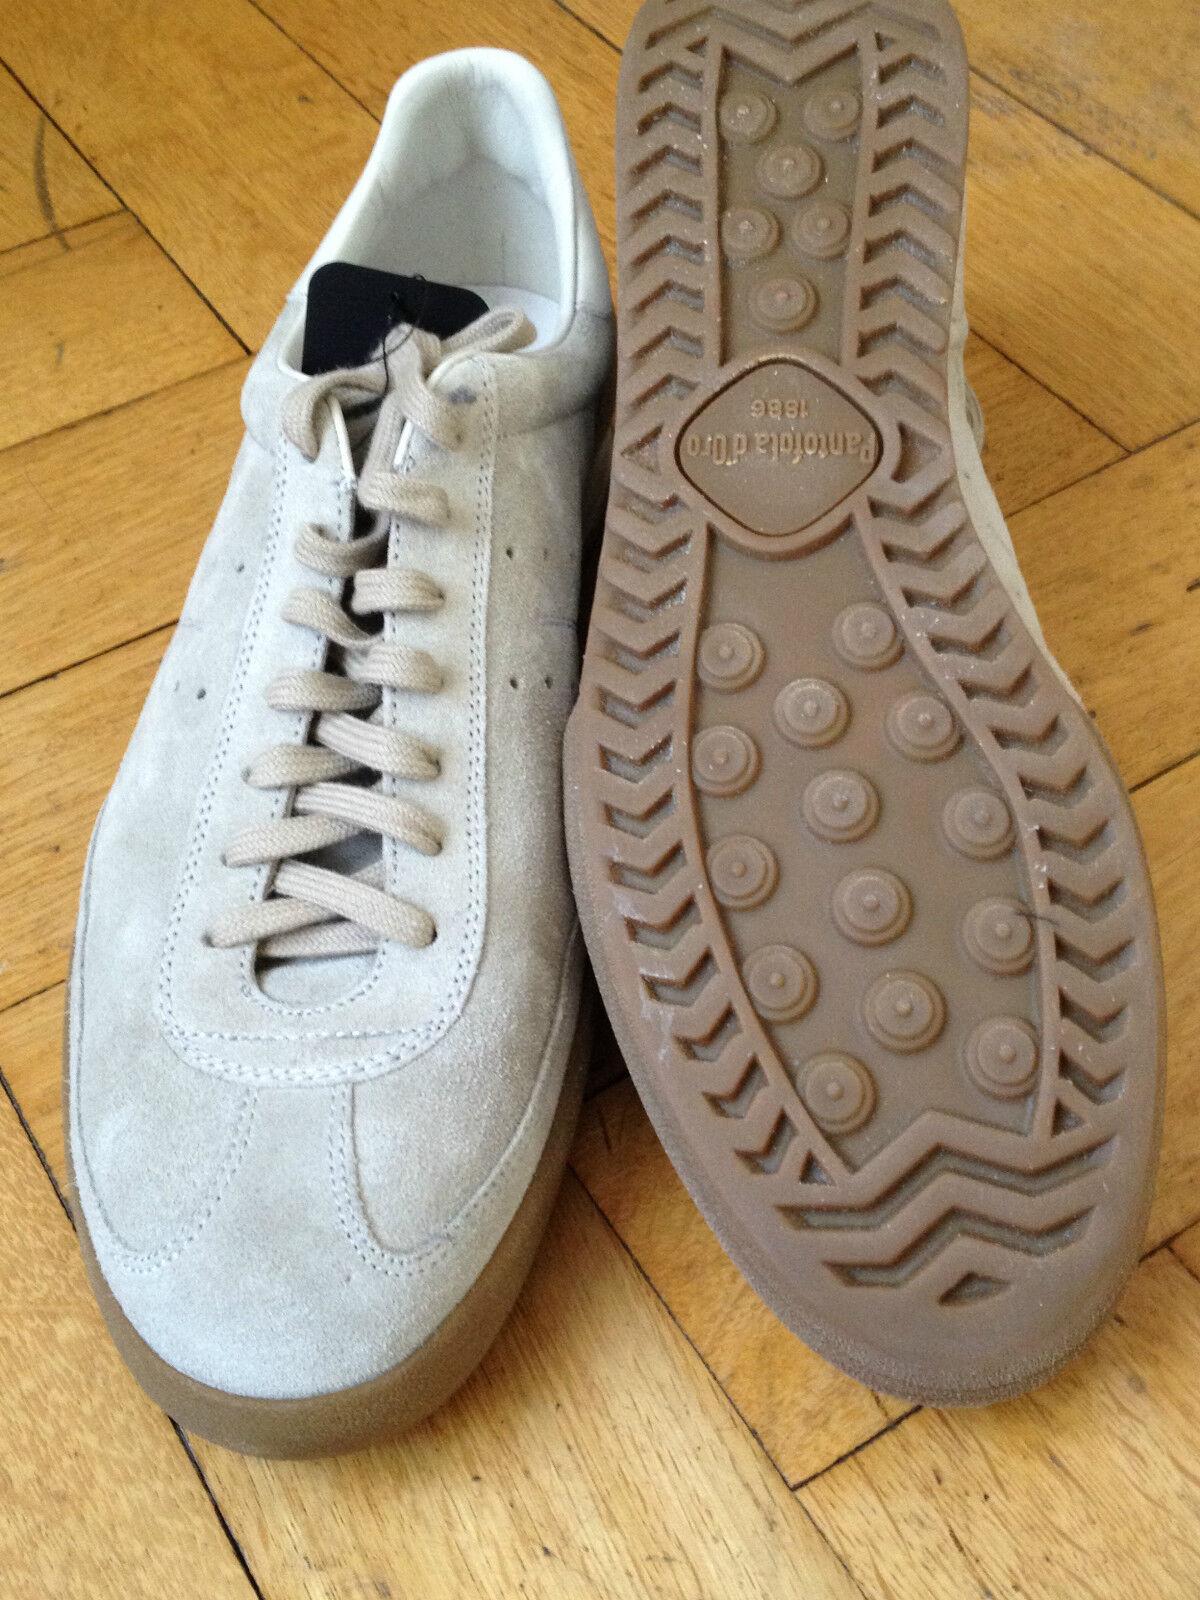 Pantofola D 'oro Scarpe Da Da Da Ginnastica scarpe da ginnastica Pelle Velour Beige EUR 45 US 11.5 86a225